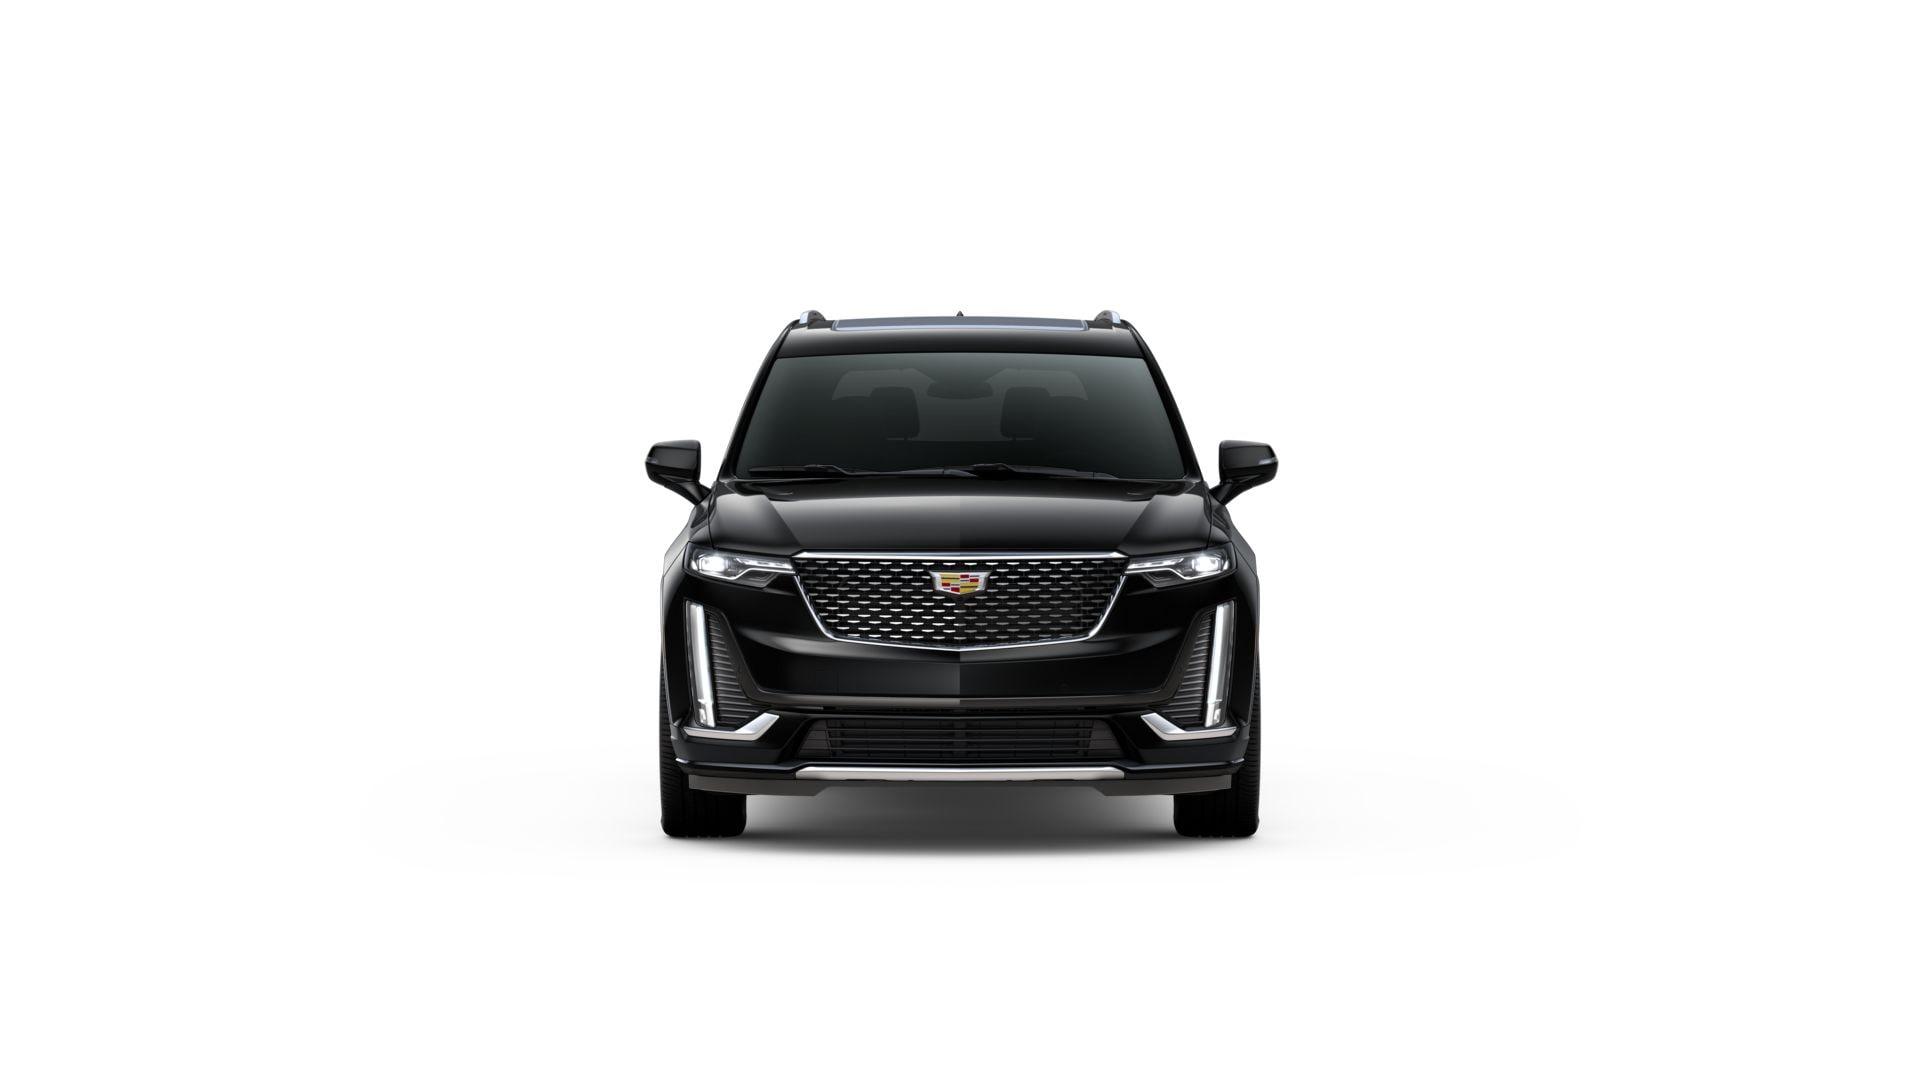 2021 CADILLAC XT6 SUV